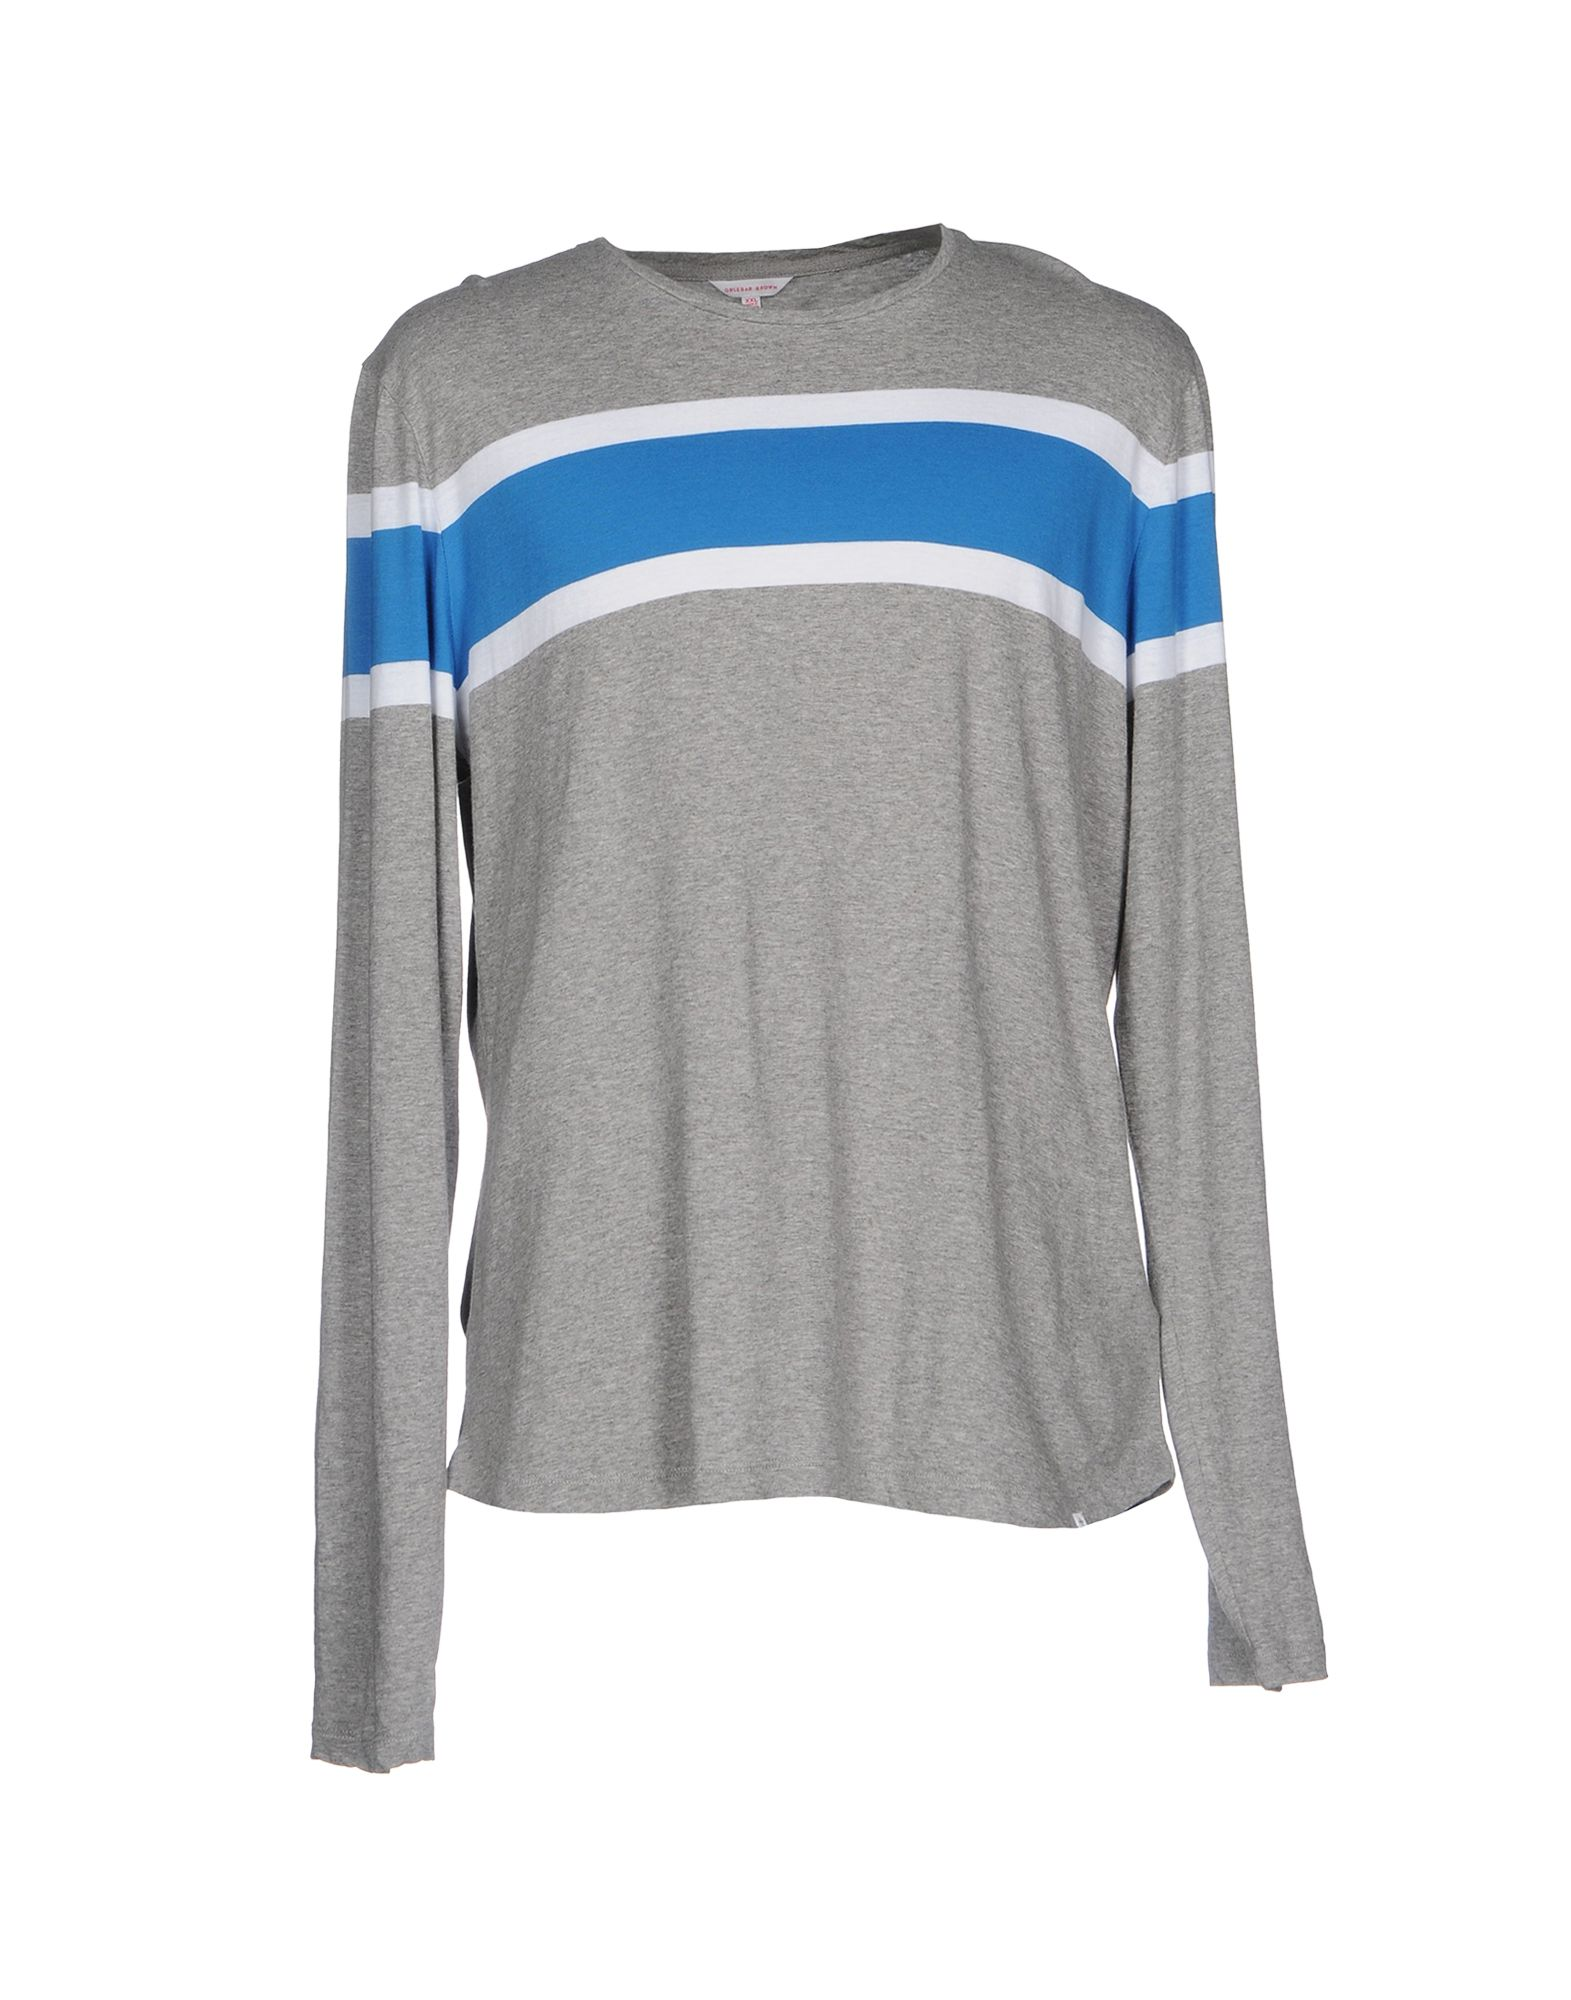 'ORLEBAR BROWN T-shirts